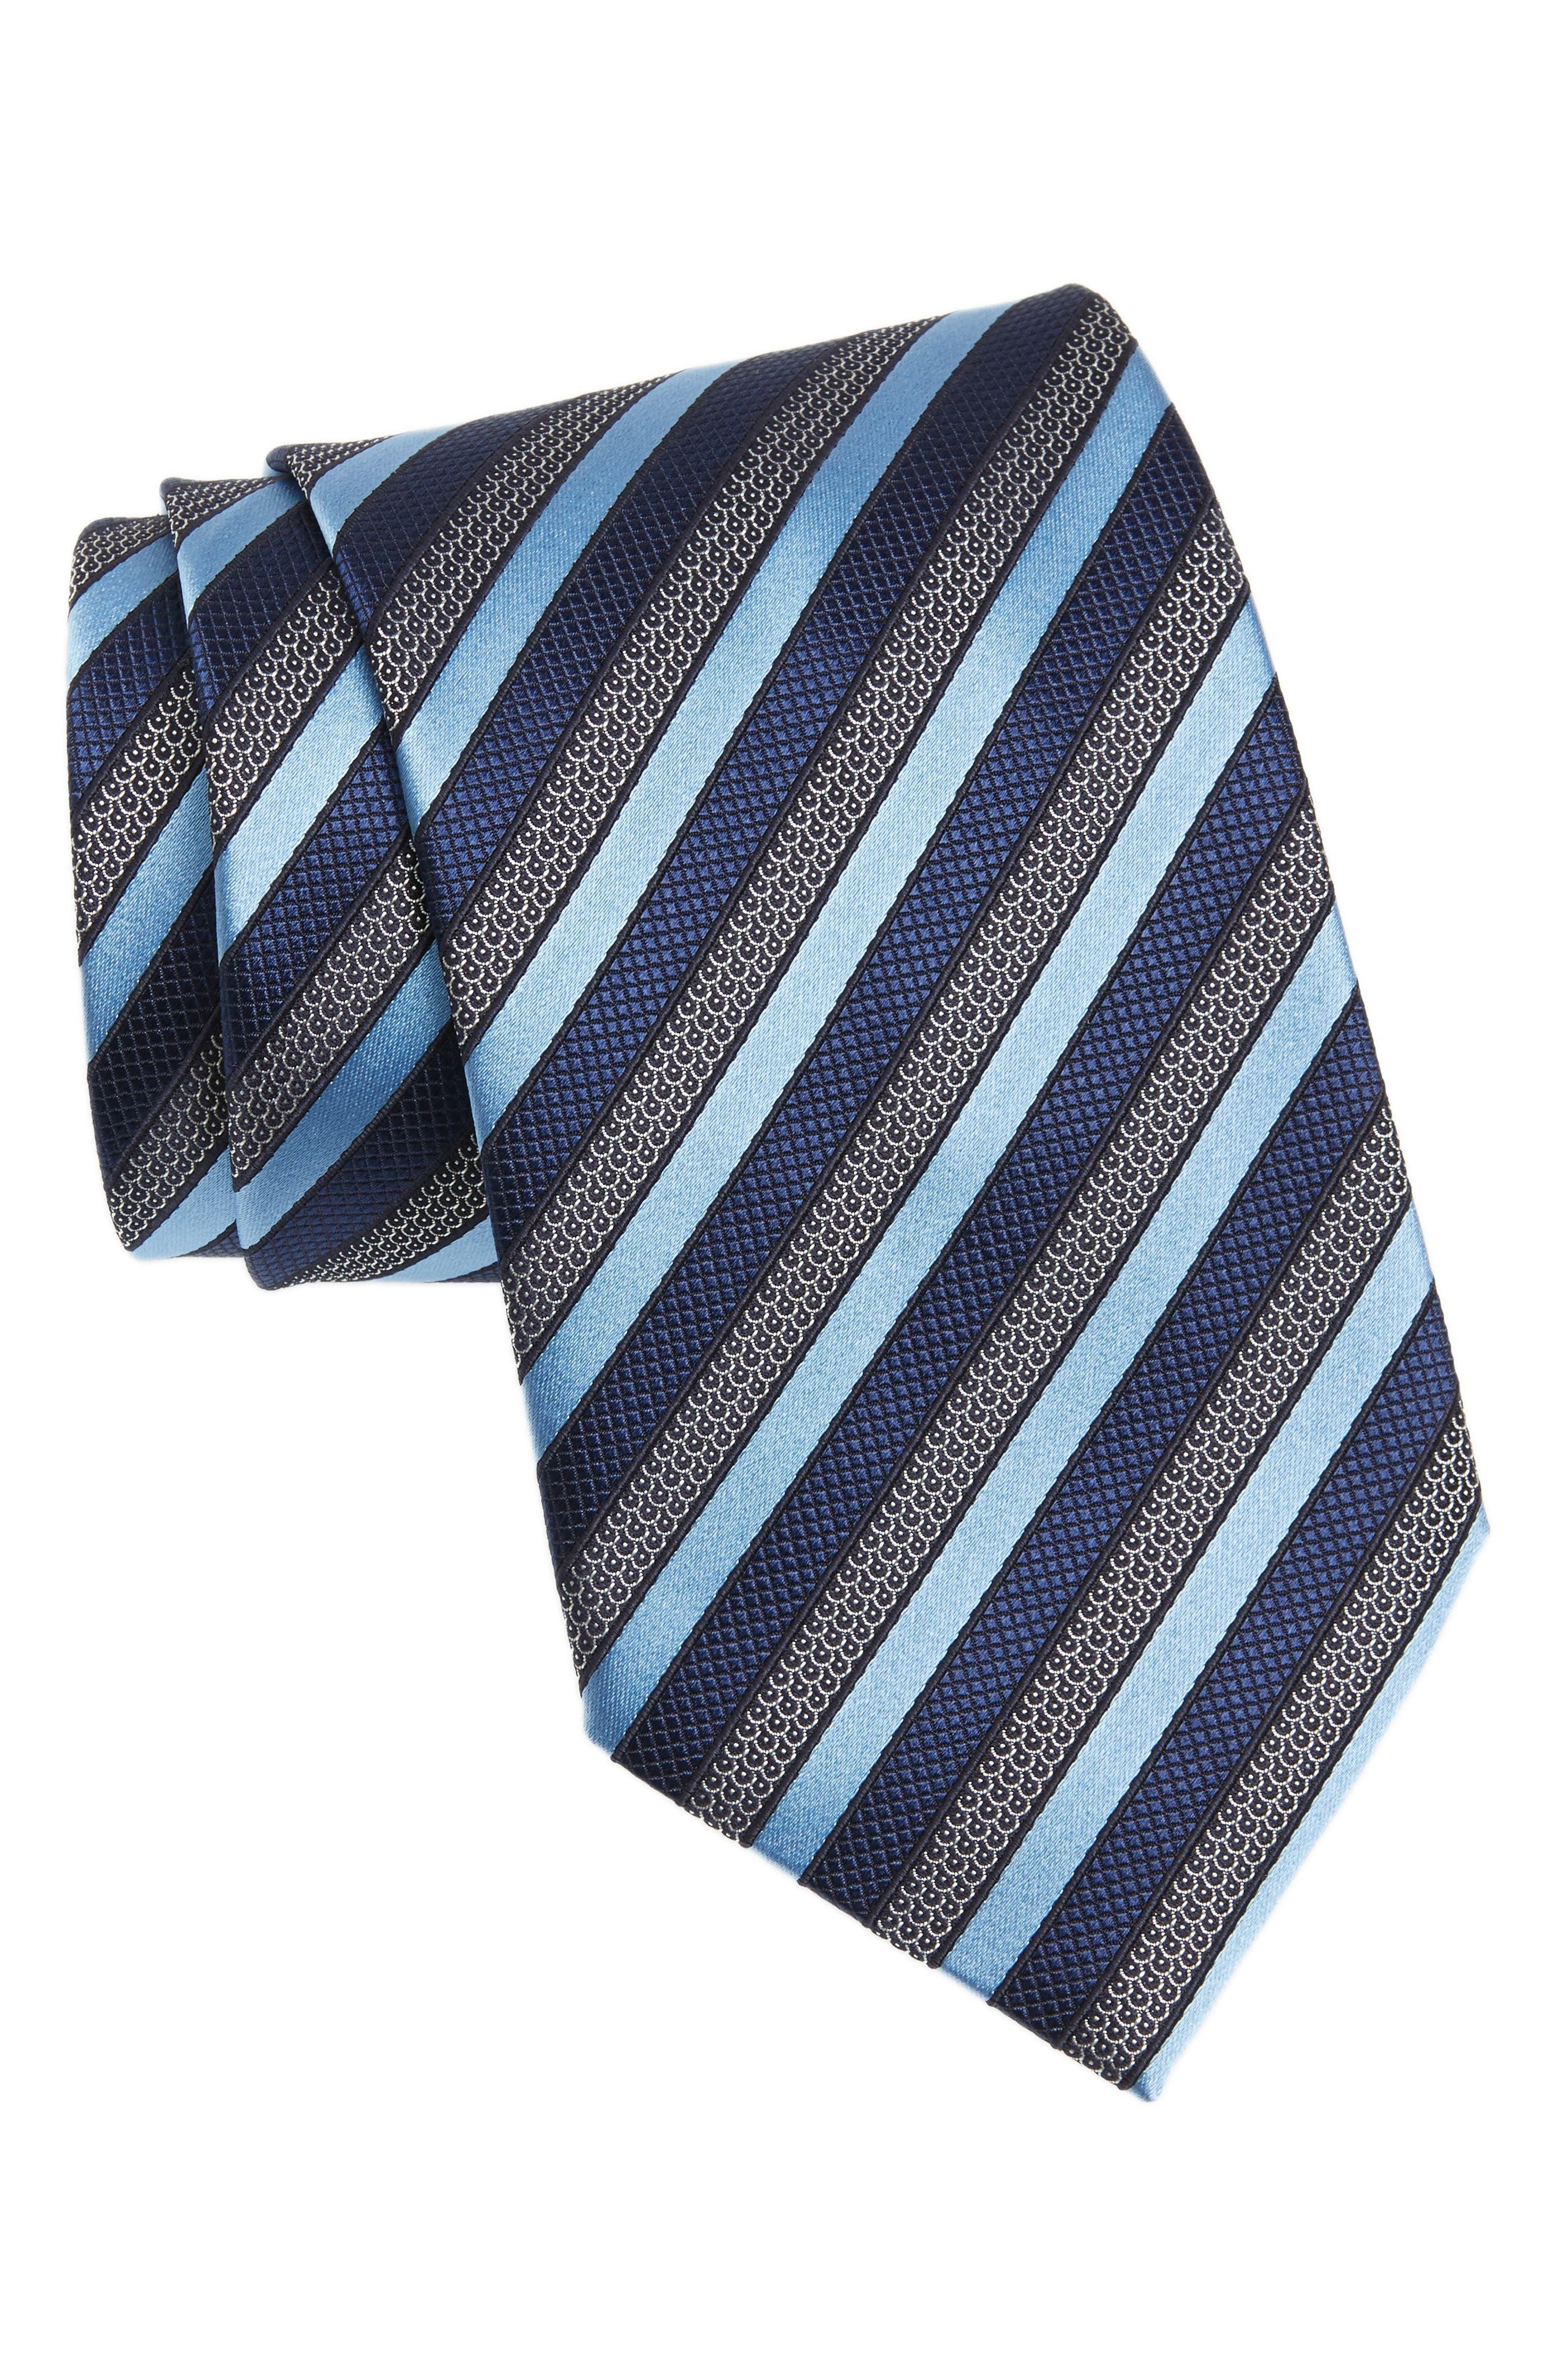 Alternate Image 1 Selected - Ermenegildo Zegna Stripe Silk Tie